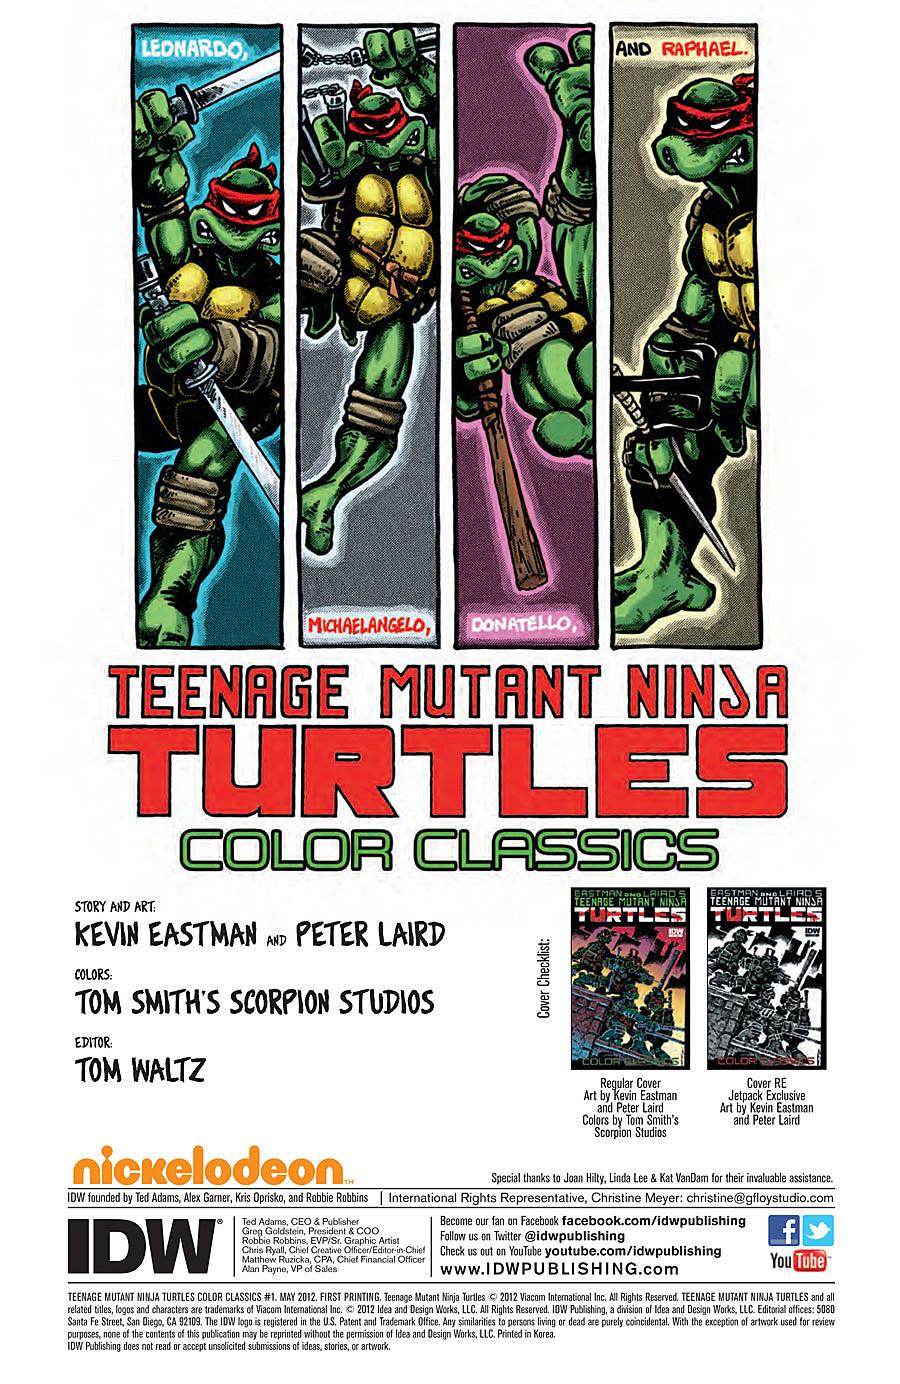 'Teenage Mutant Ninja Turtles Color Classics' #1 Comes Out ...